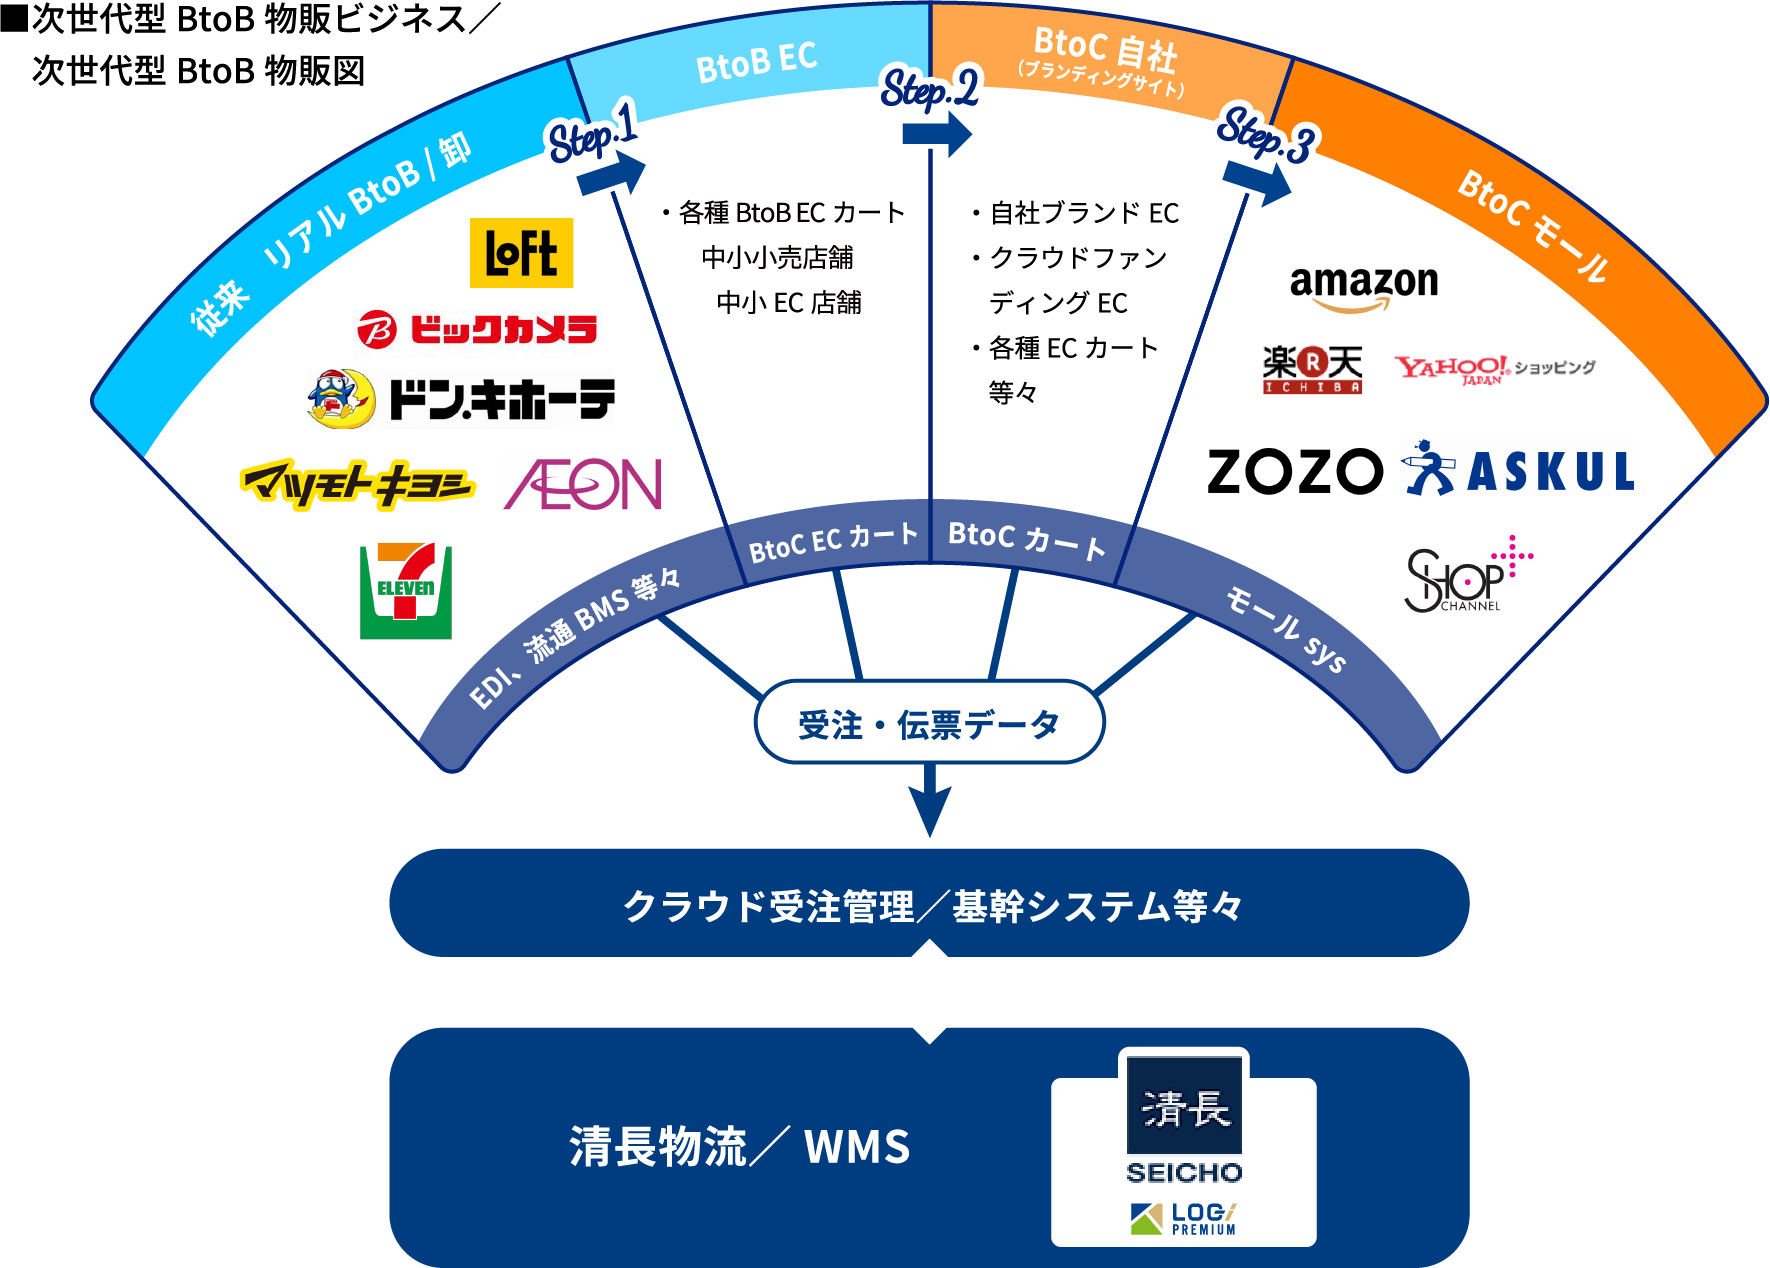 ■次世代型BtoB物販ビジネス/ 次世代型BtoB物販図